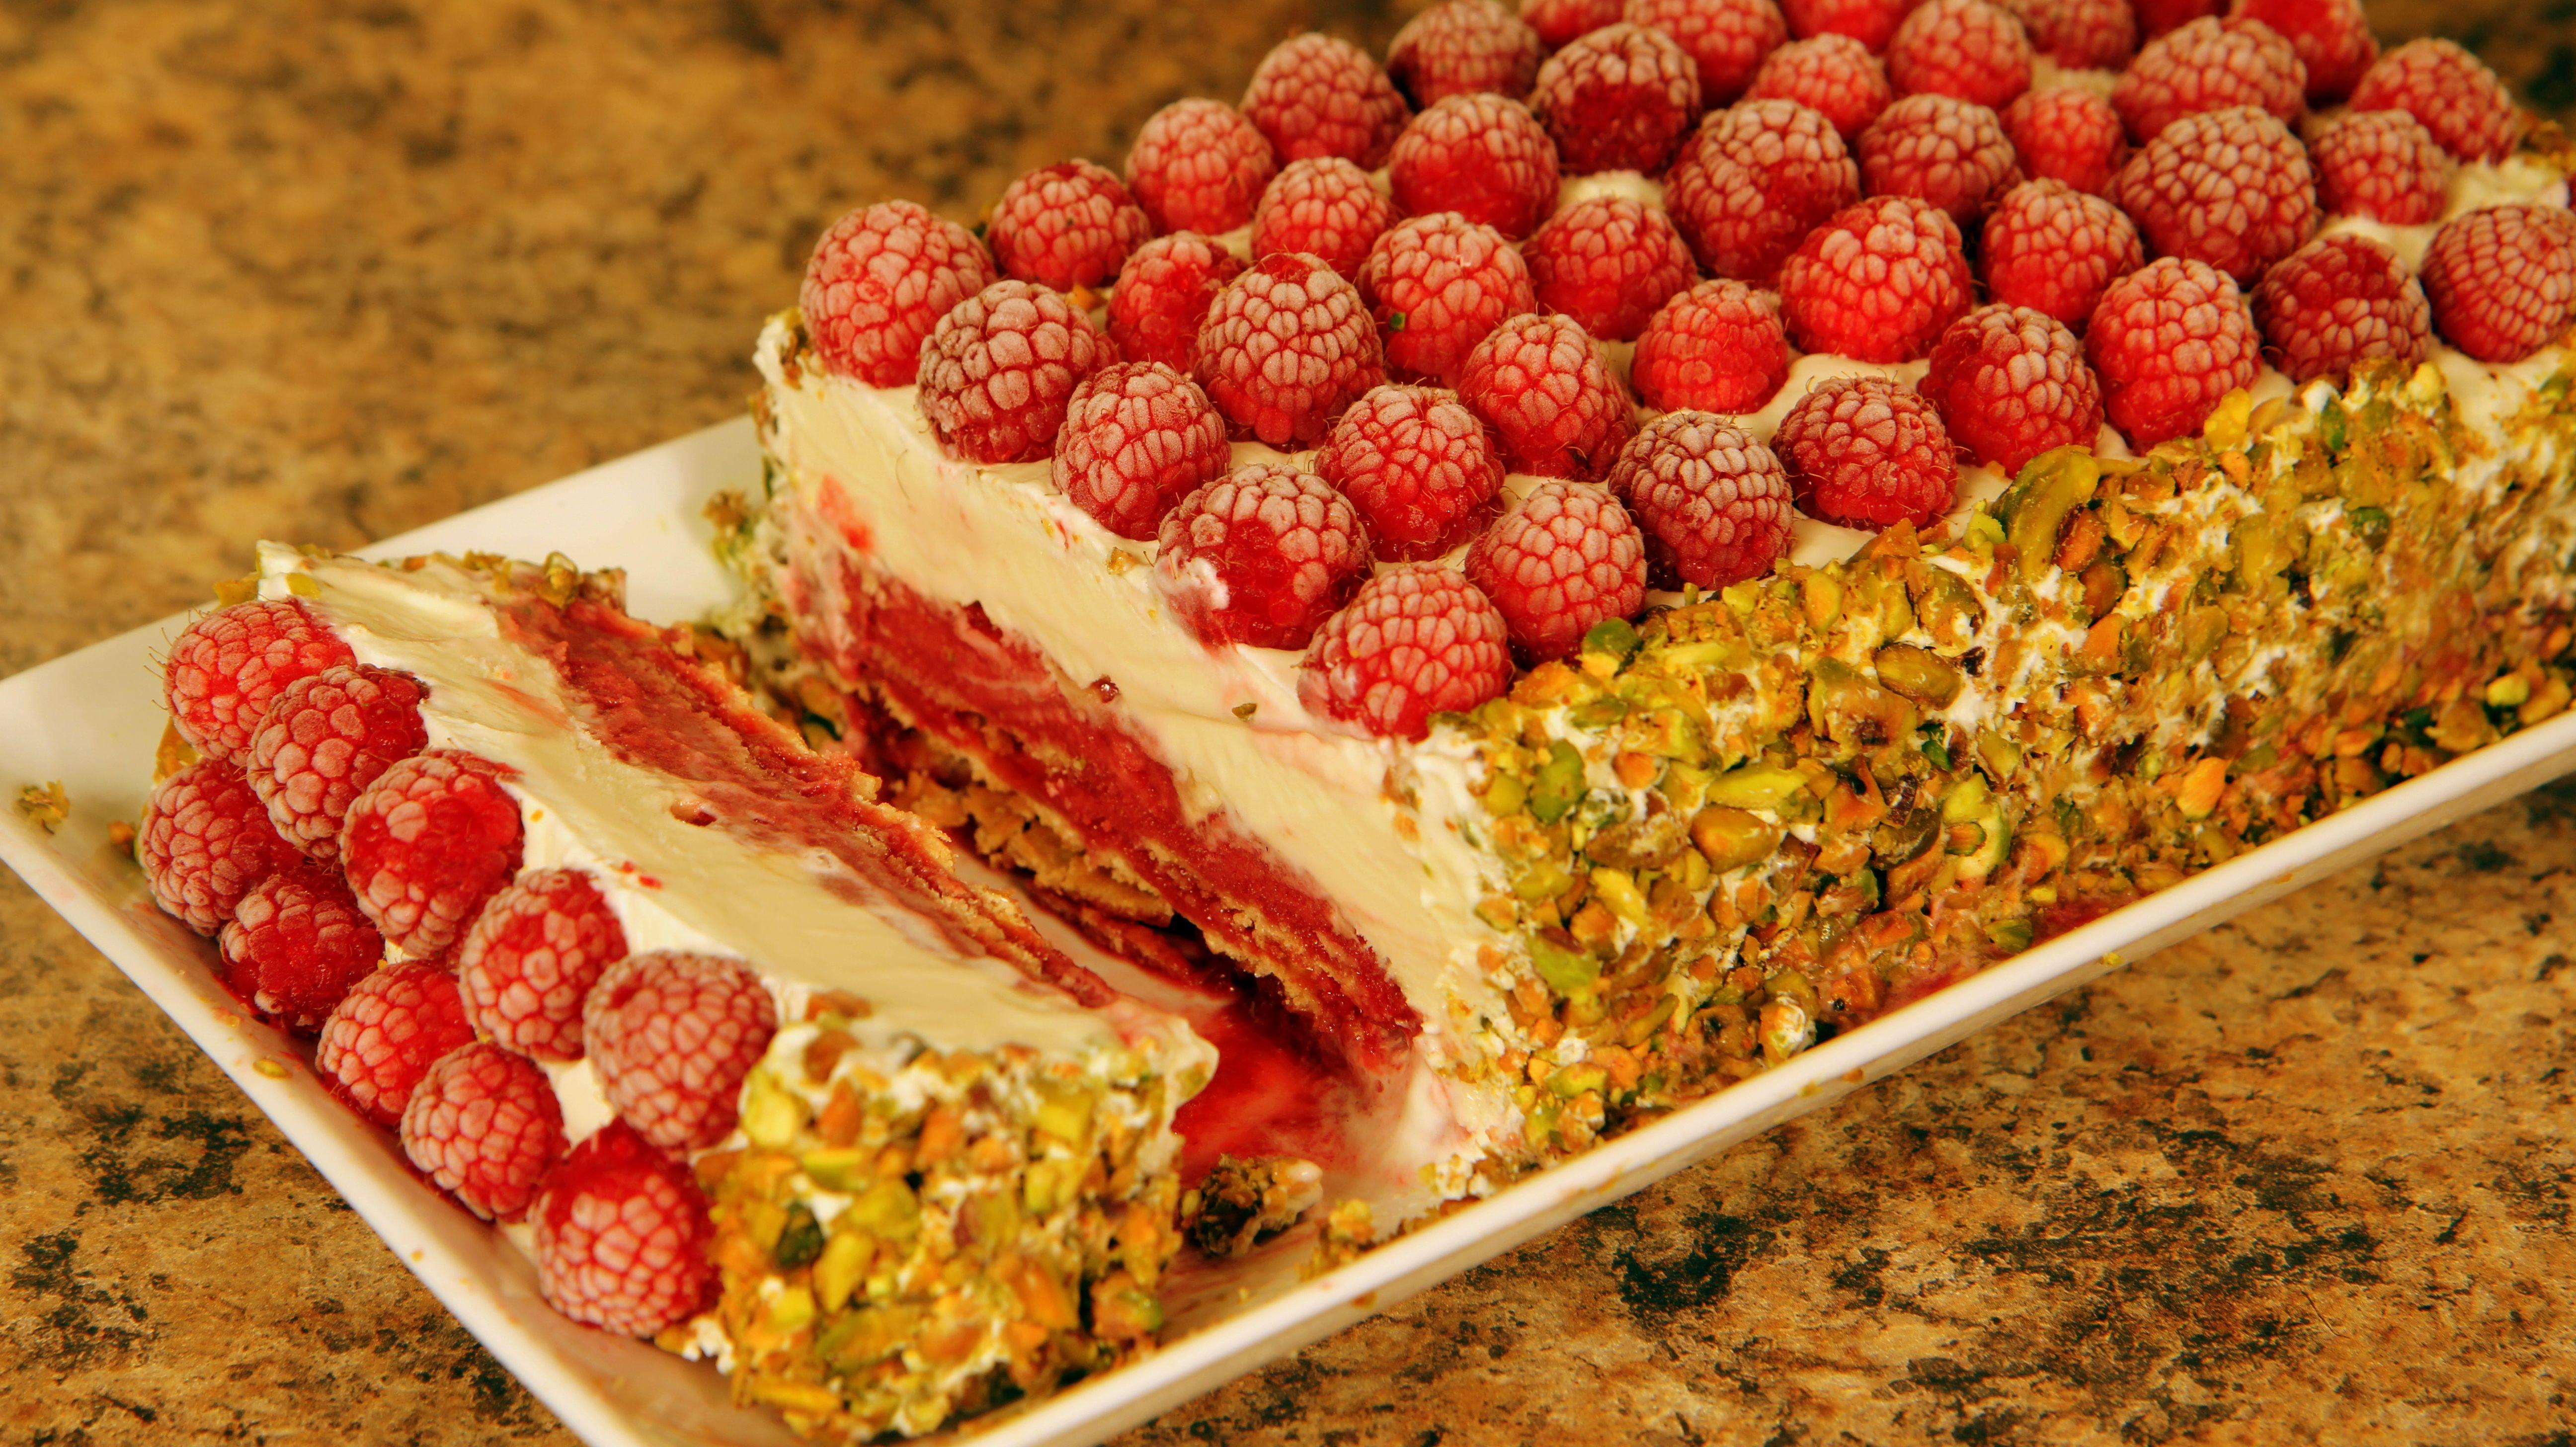 Festive Ice Cream Cake - Recipe at: cookingwithalia.c...